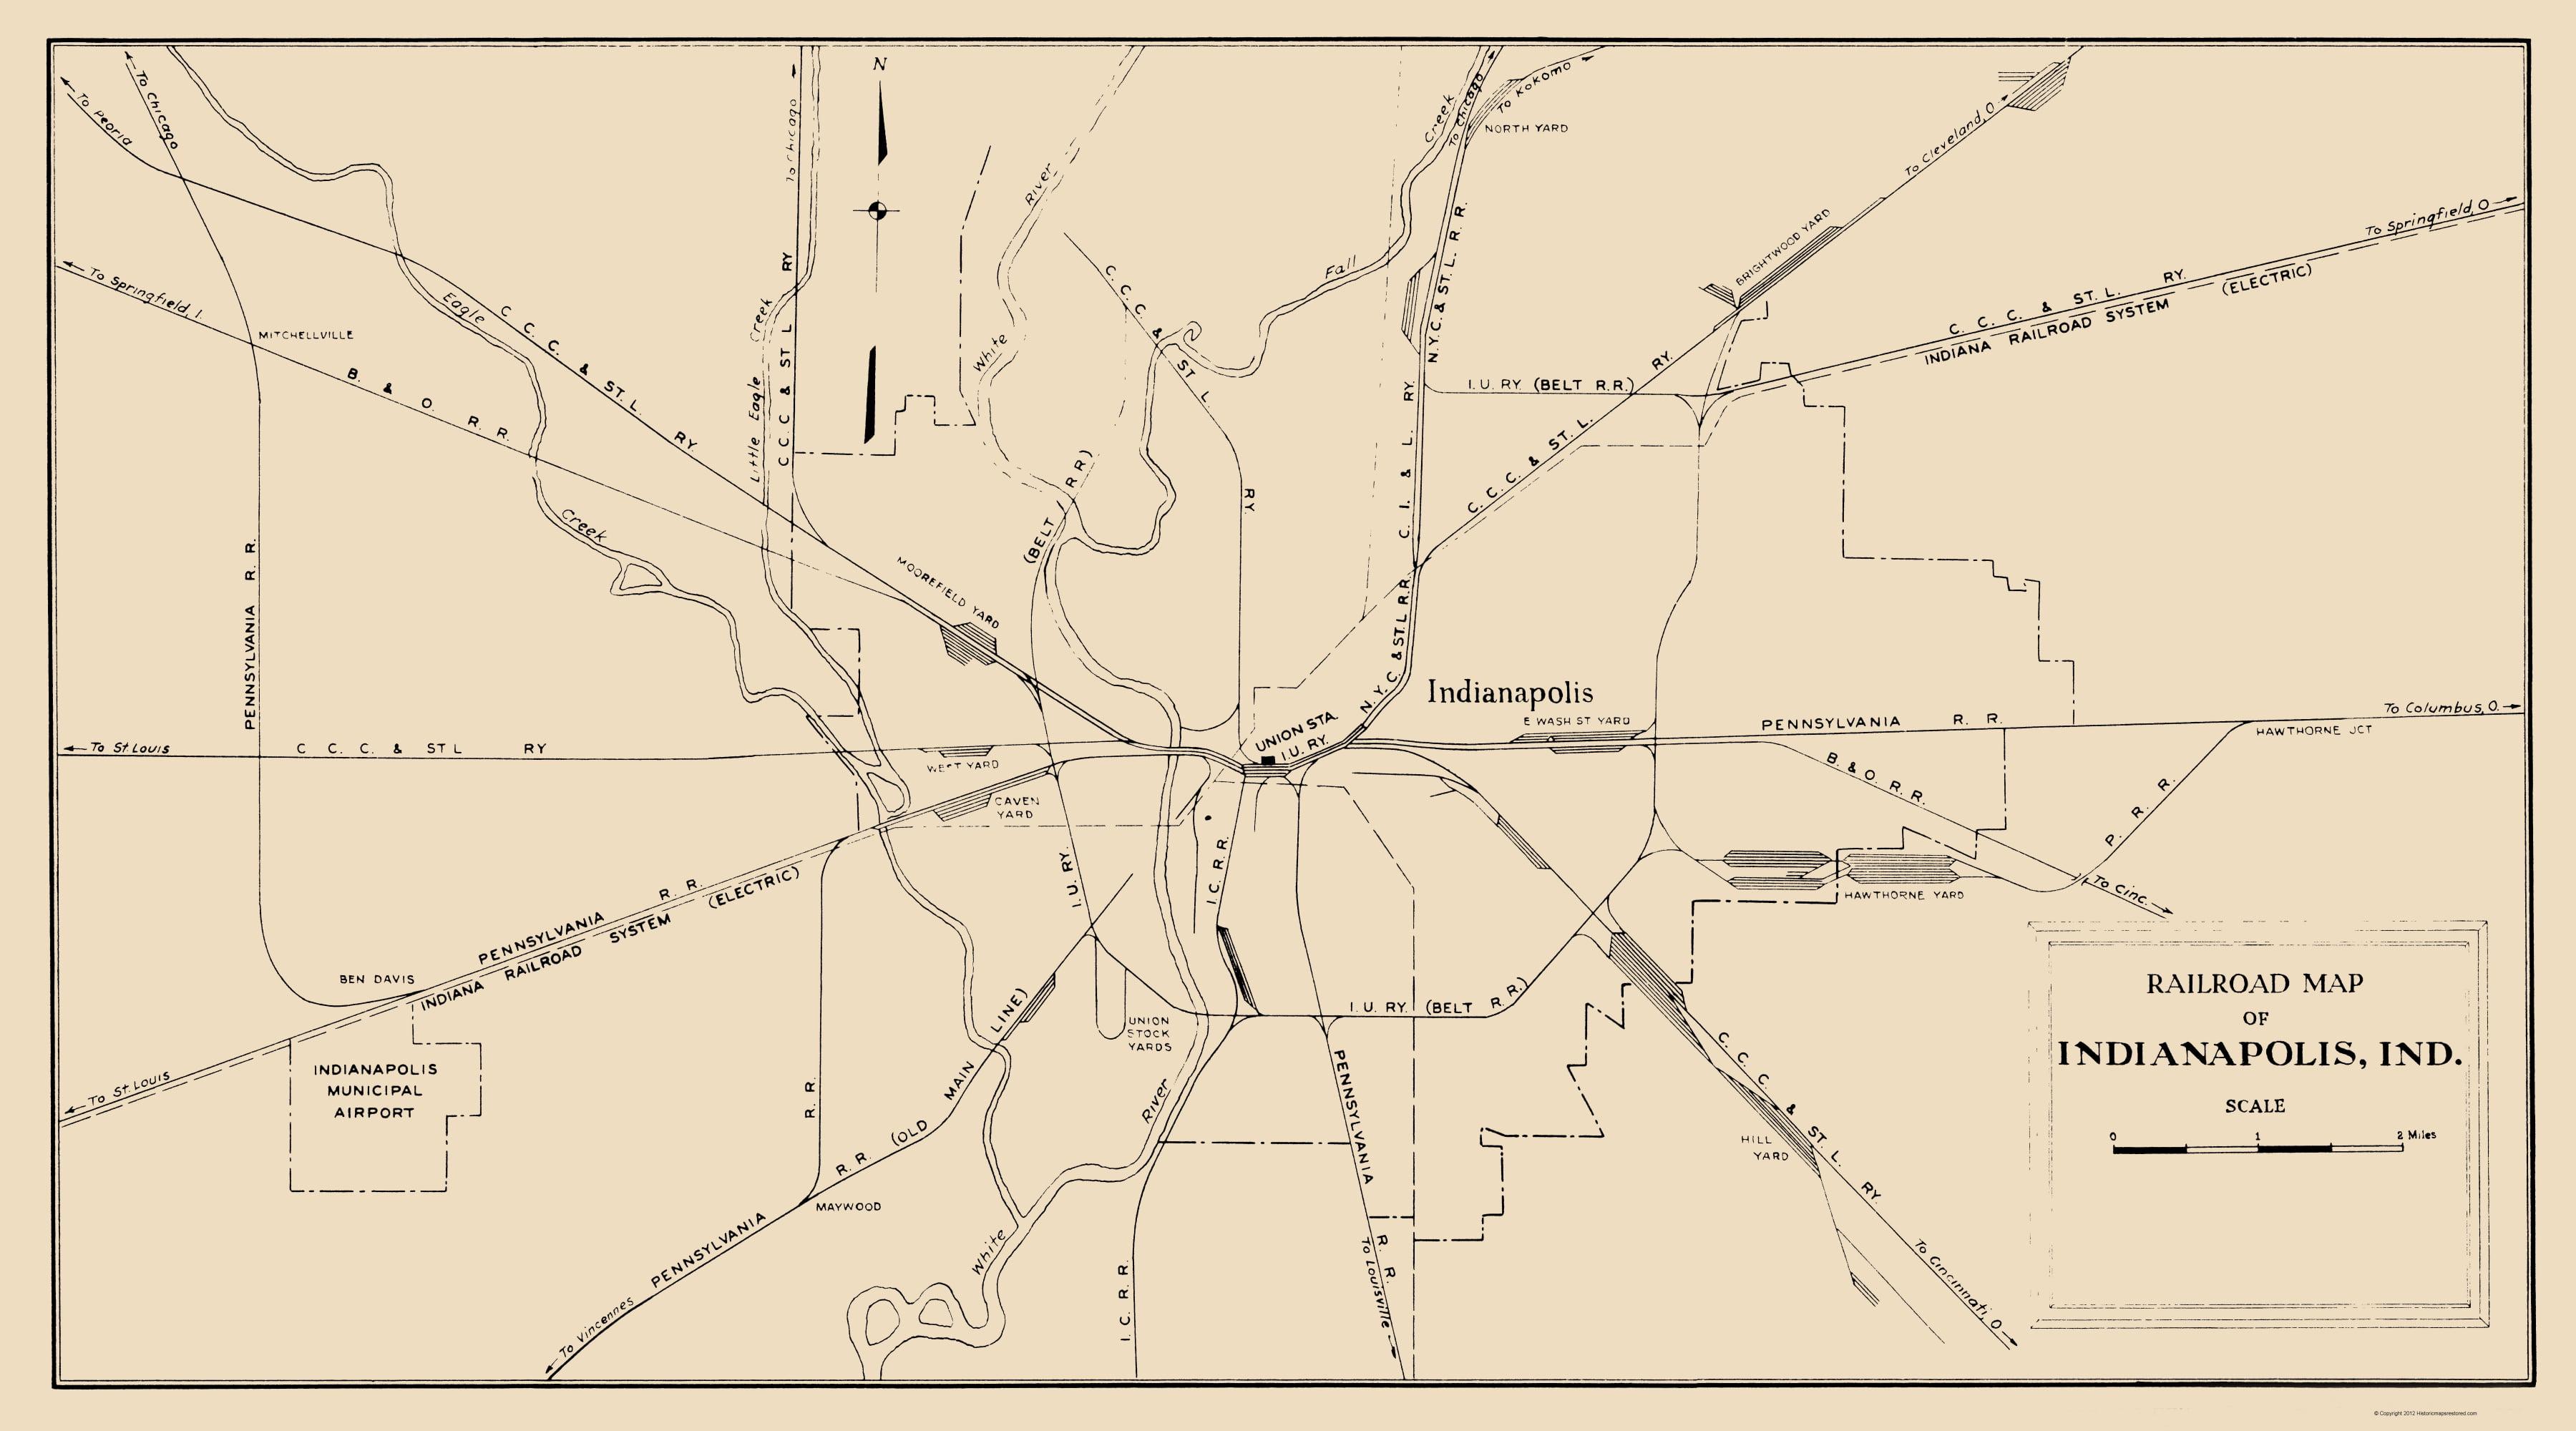 Old Railroad Map Indianapolis Indiana Railroad Map Monon Railway